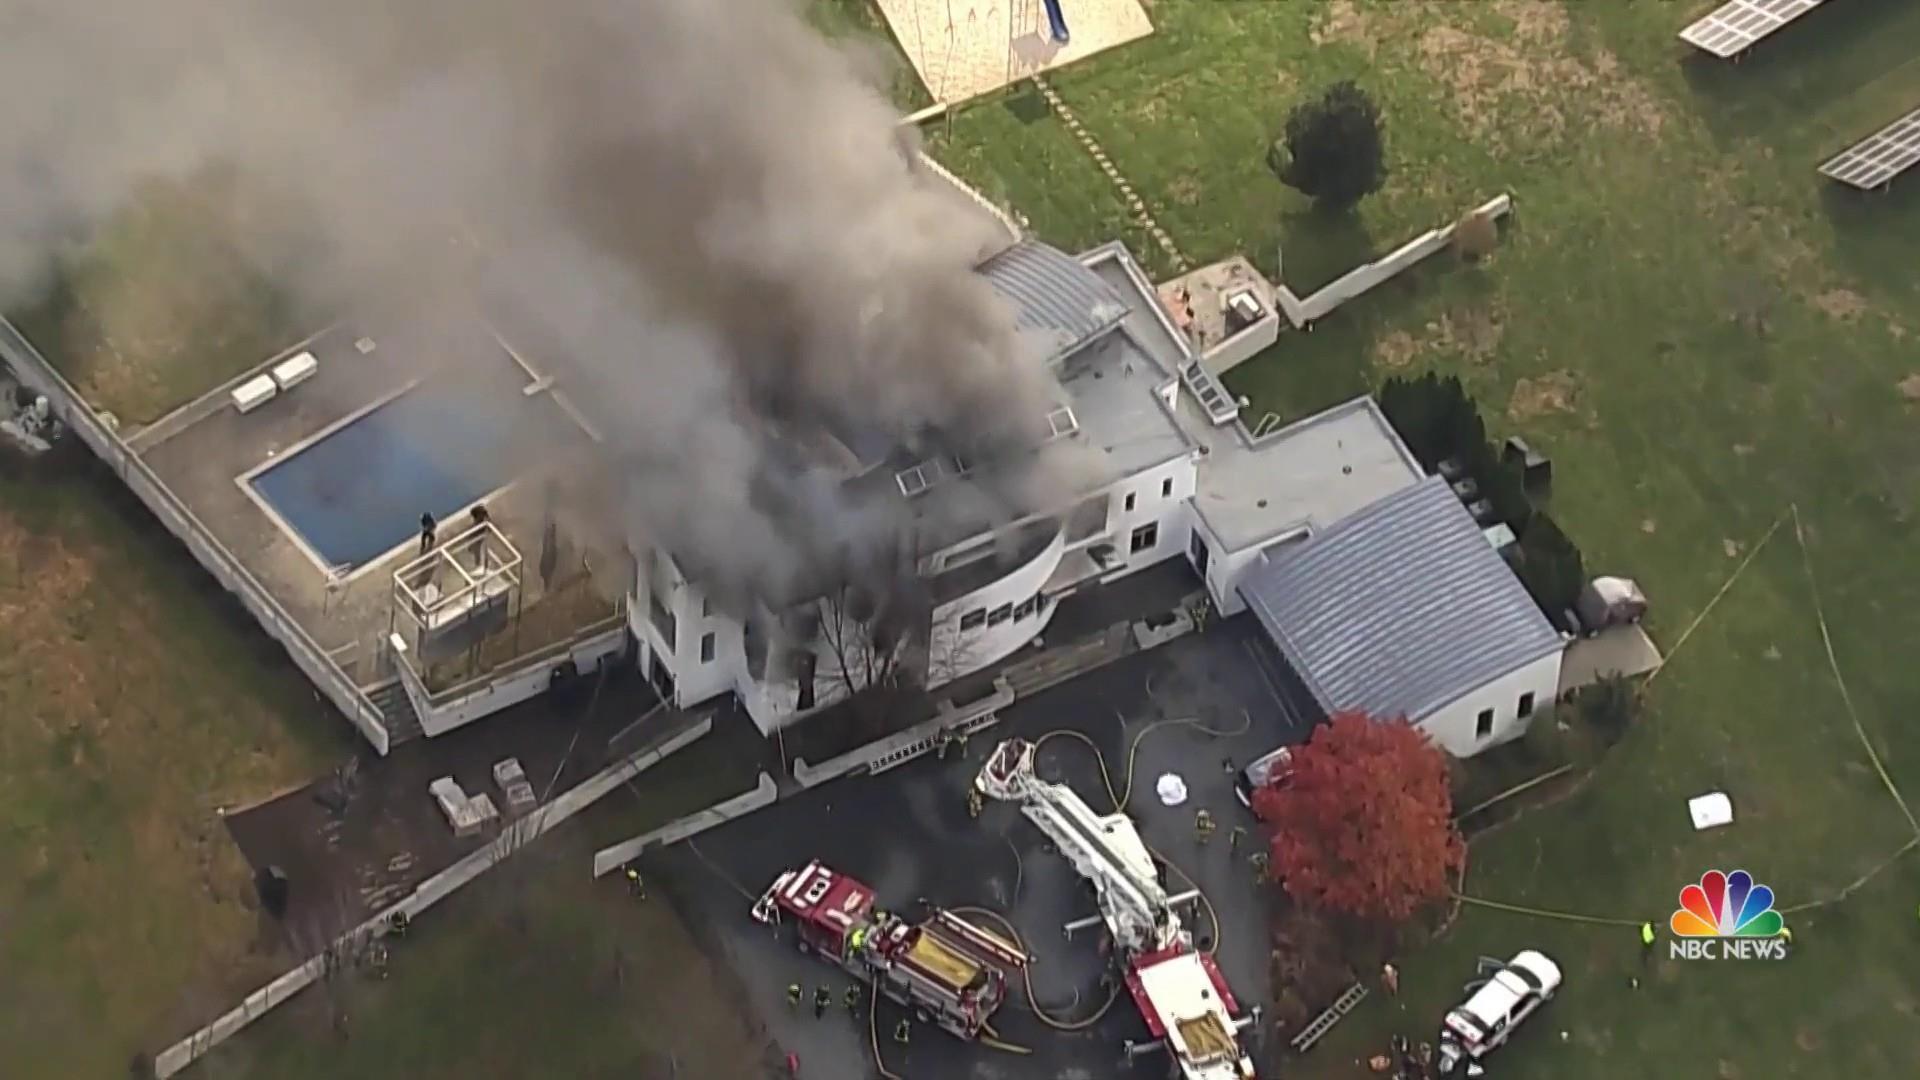 Four people dead in New Jersey fire mystery